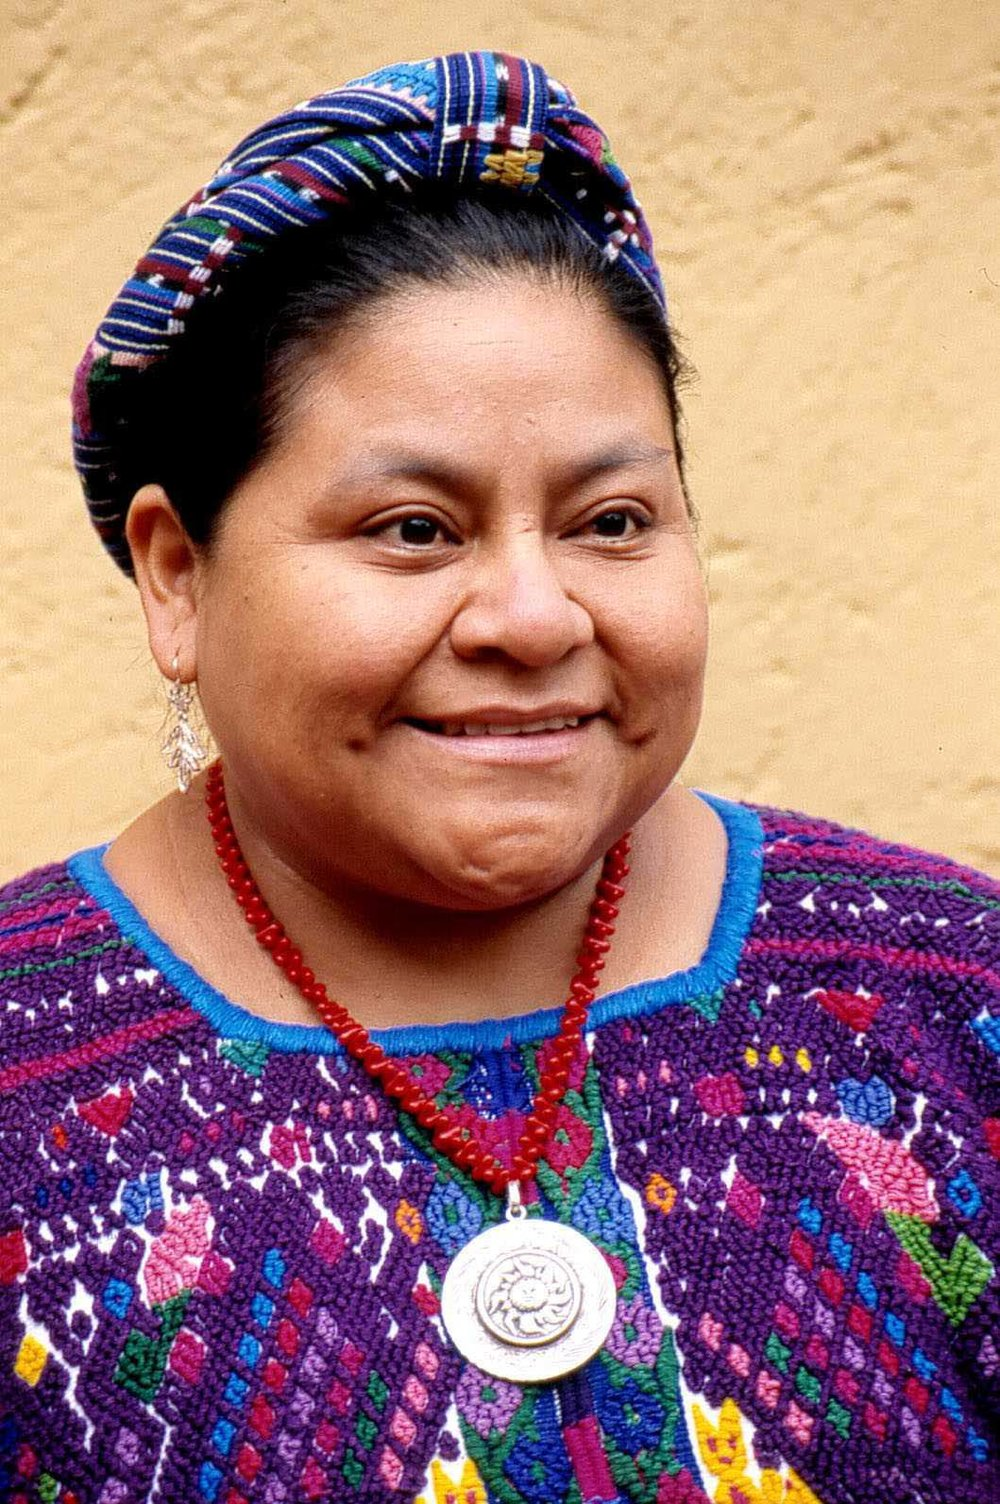 Rigoberta Menchú - Guatemalan indigenous rights and womens rights activist, Nobel Peace Prize recipient